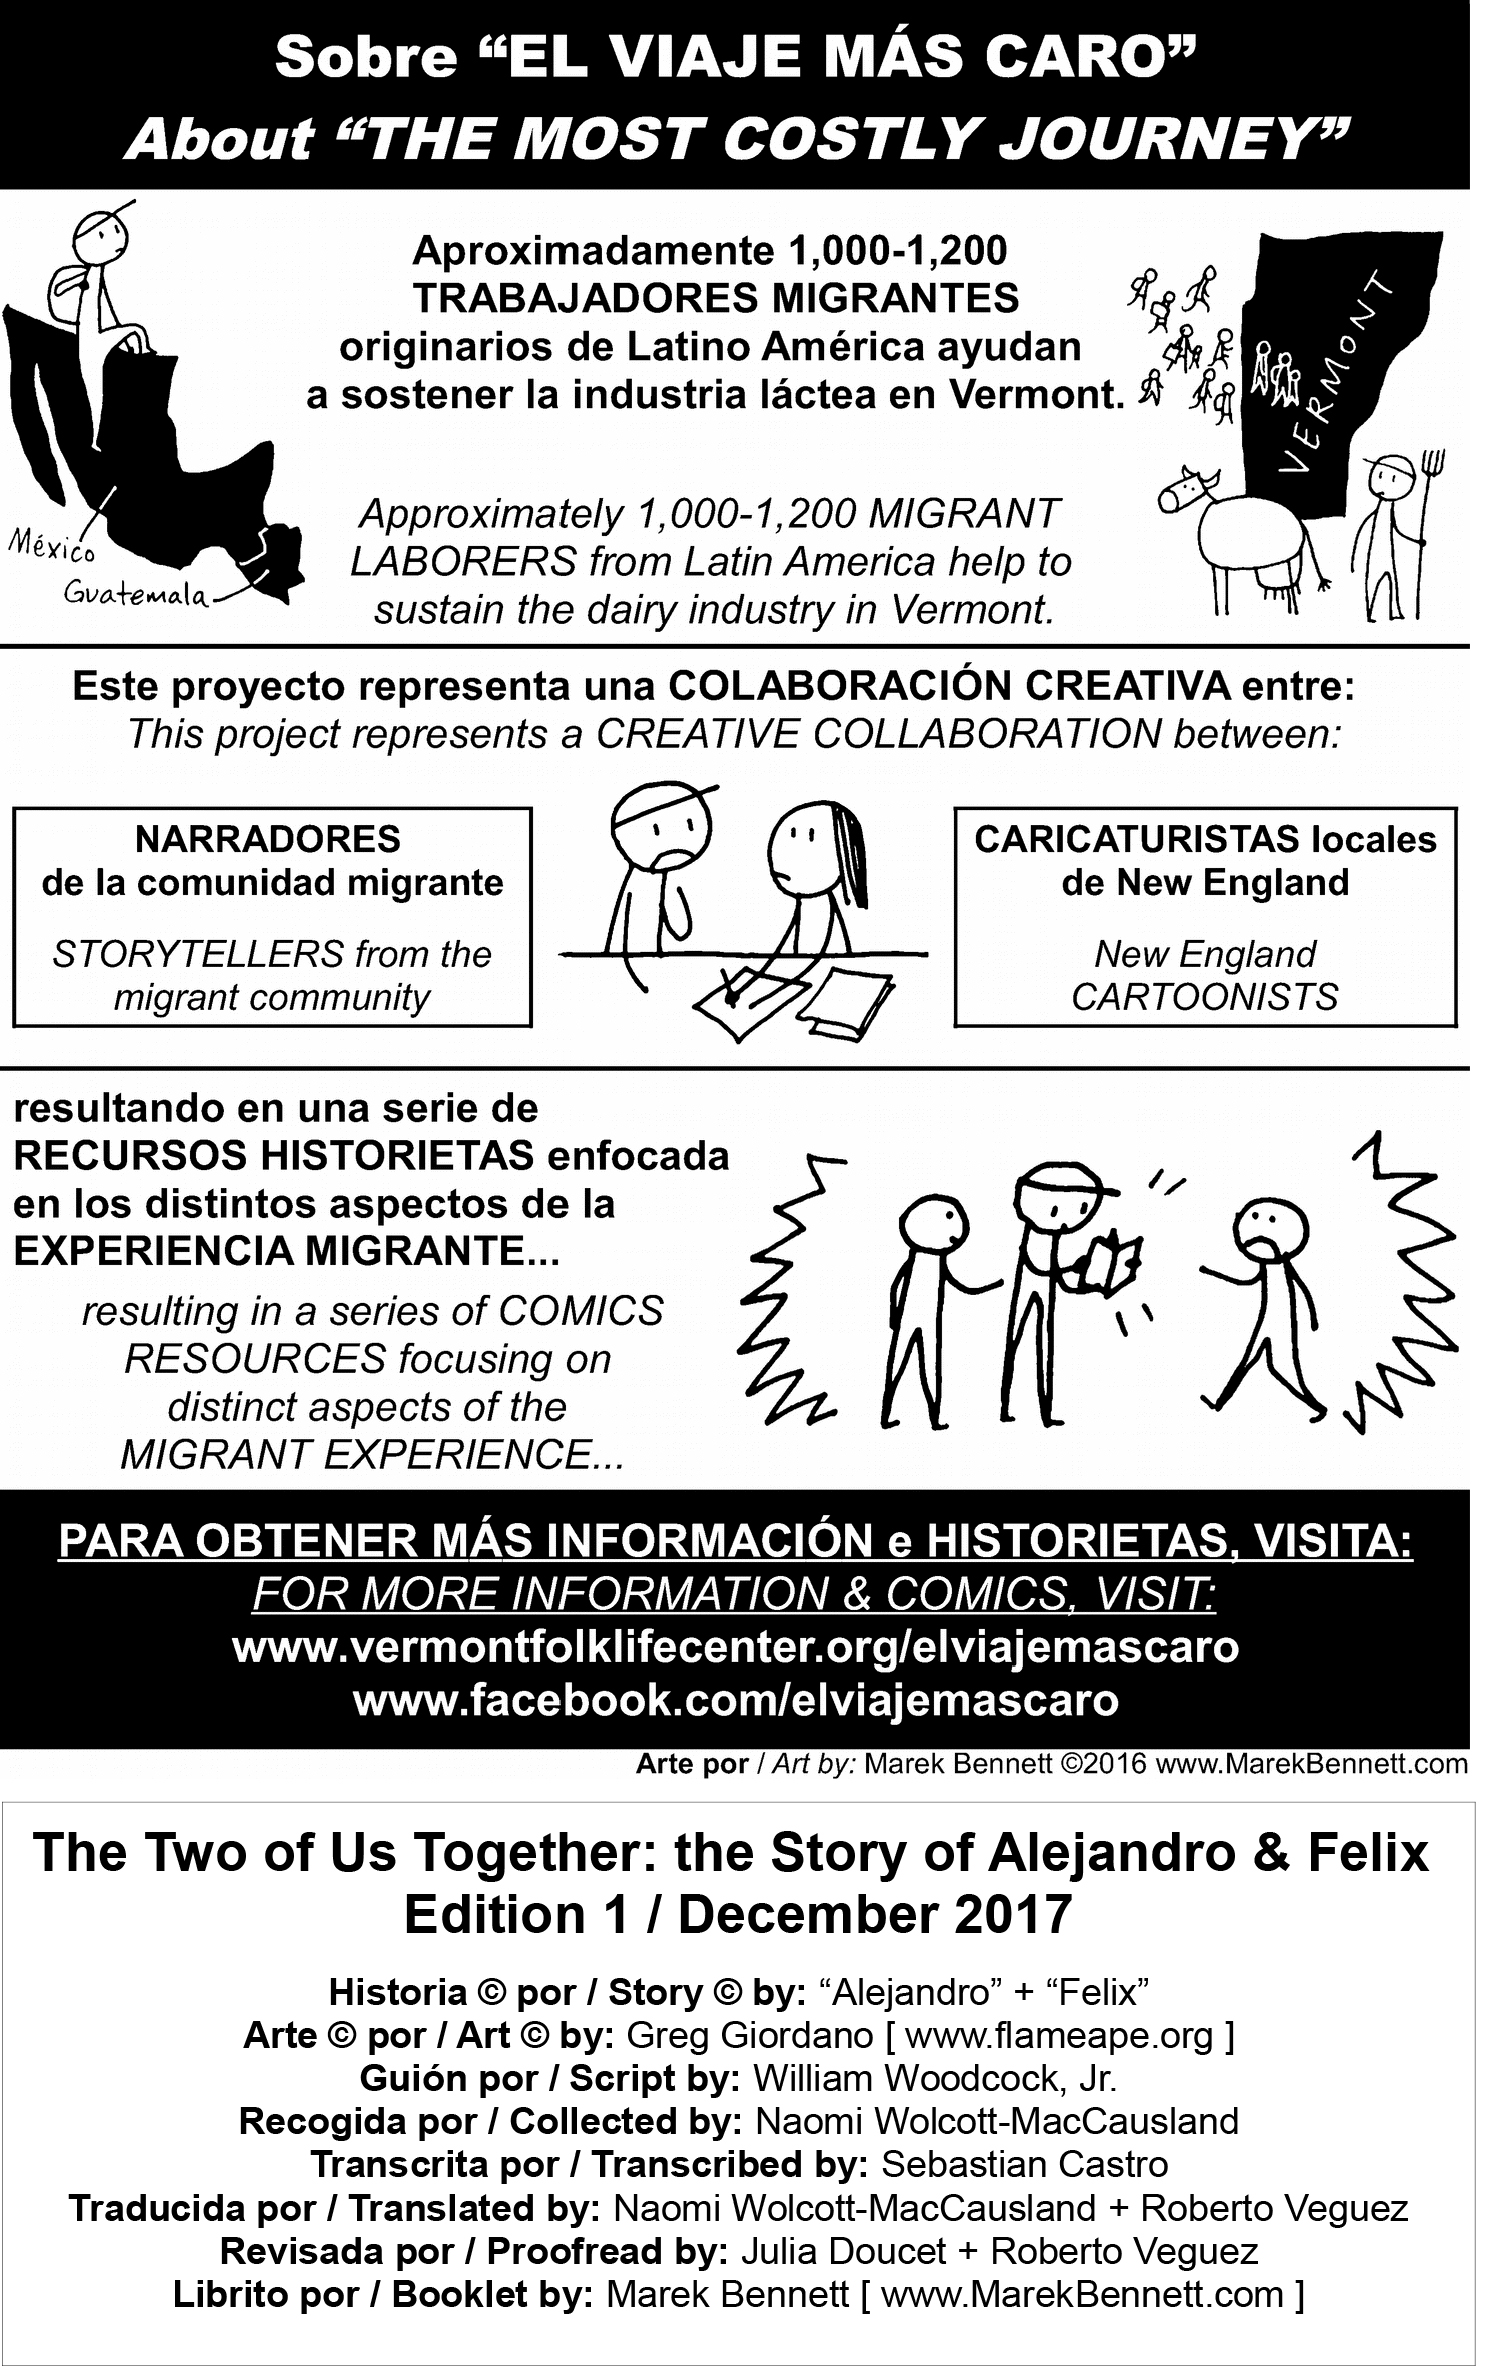 BOOKLET-Alejandro+Felix+Greg-171200-Digest_ENG 2.jpg